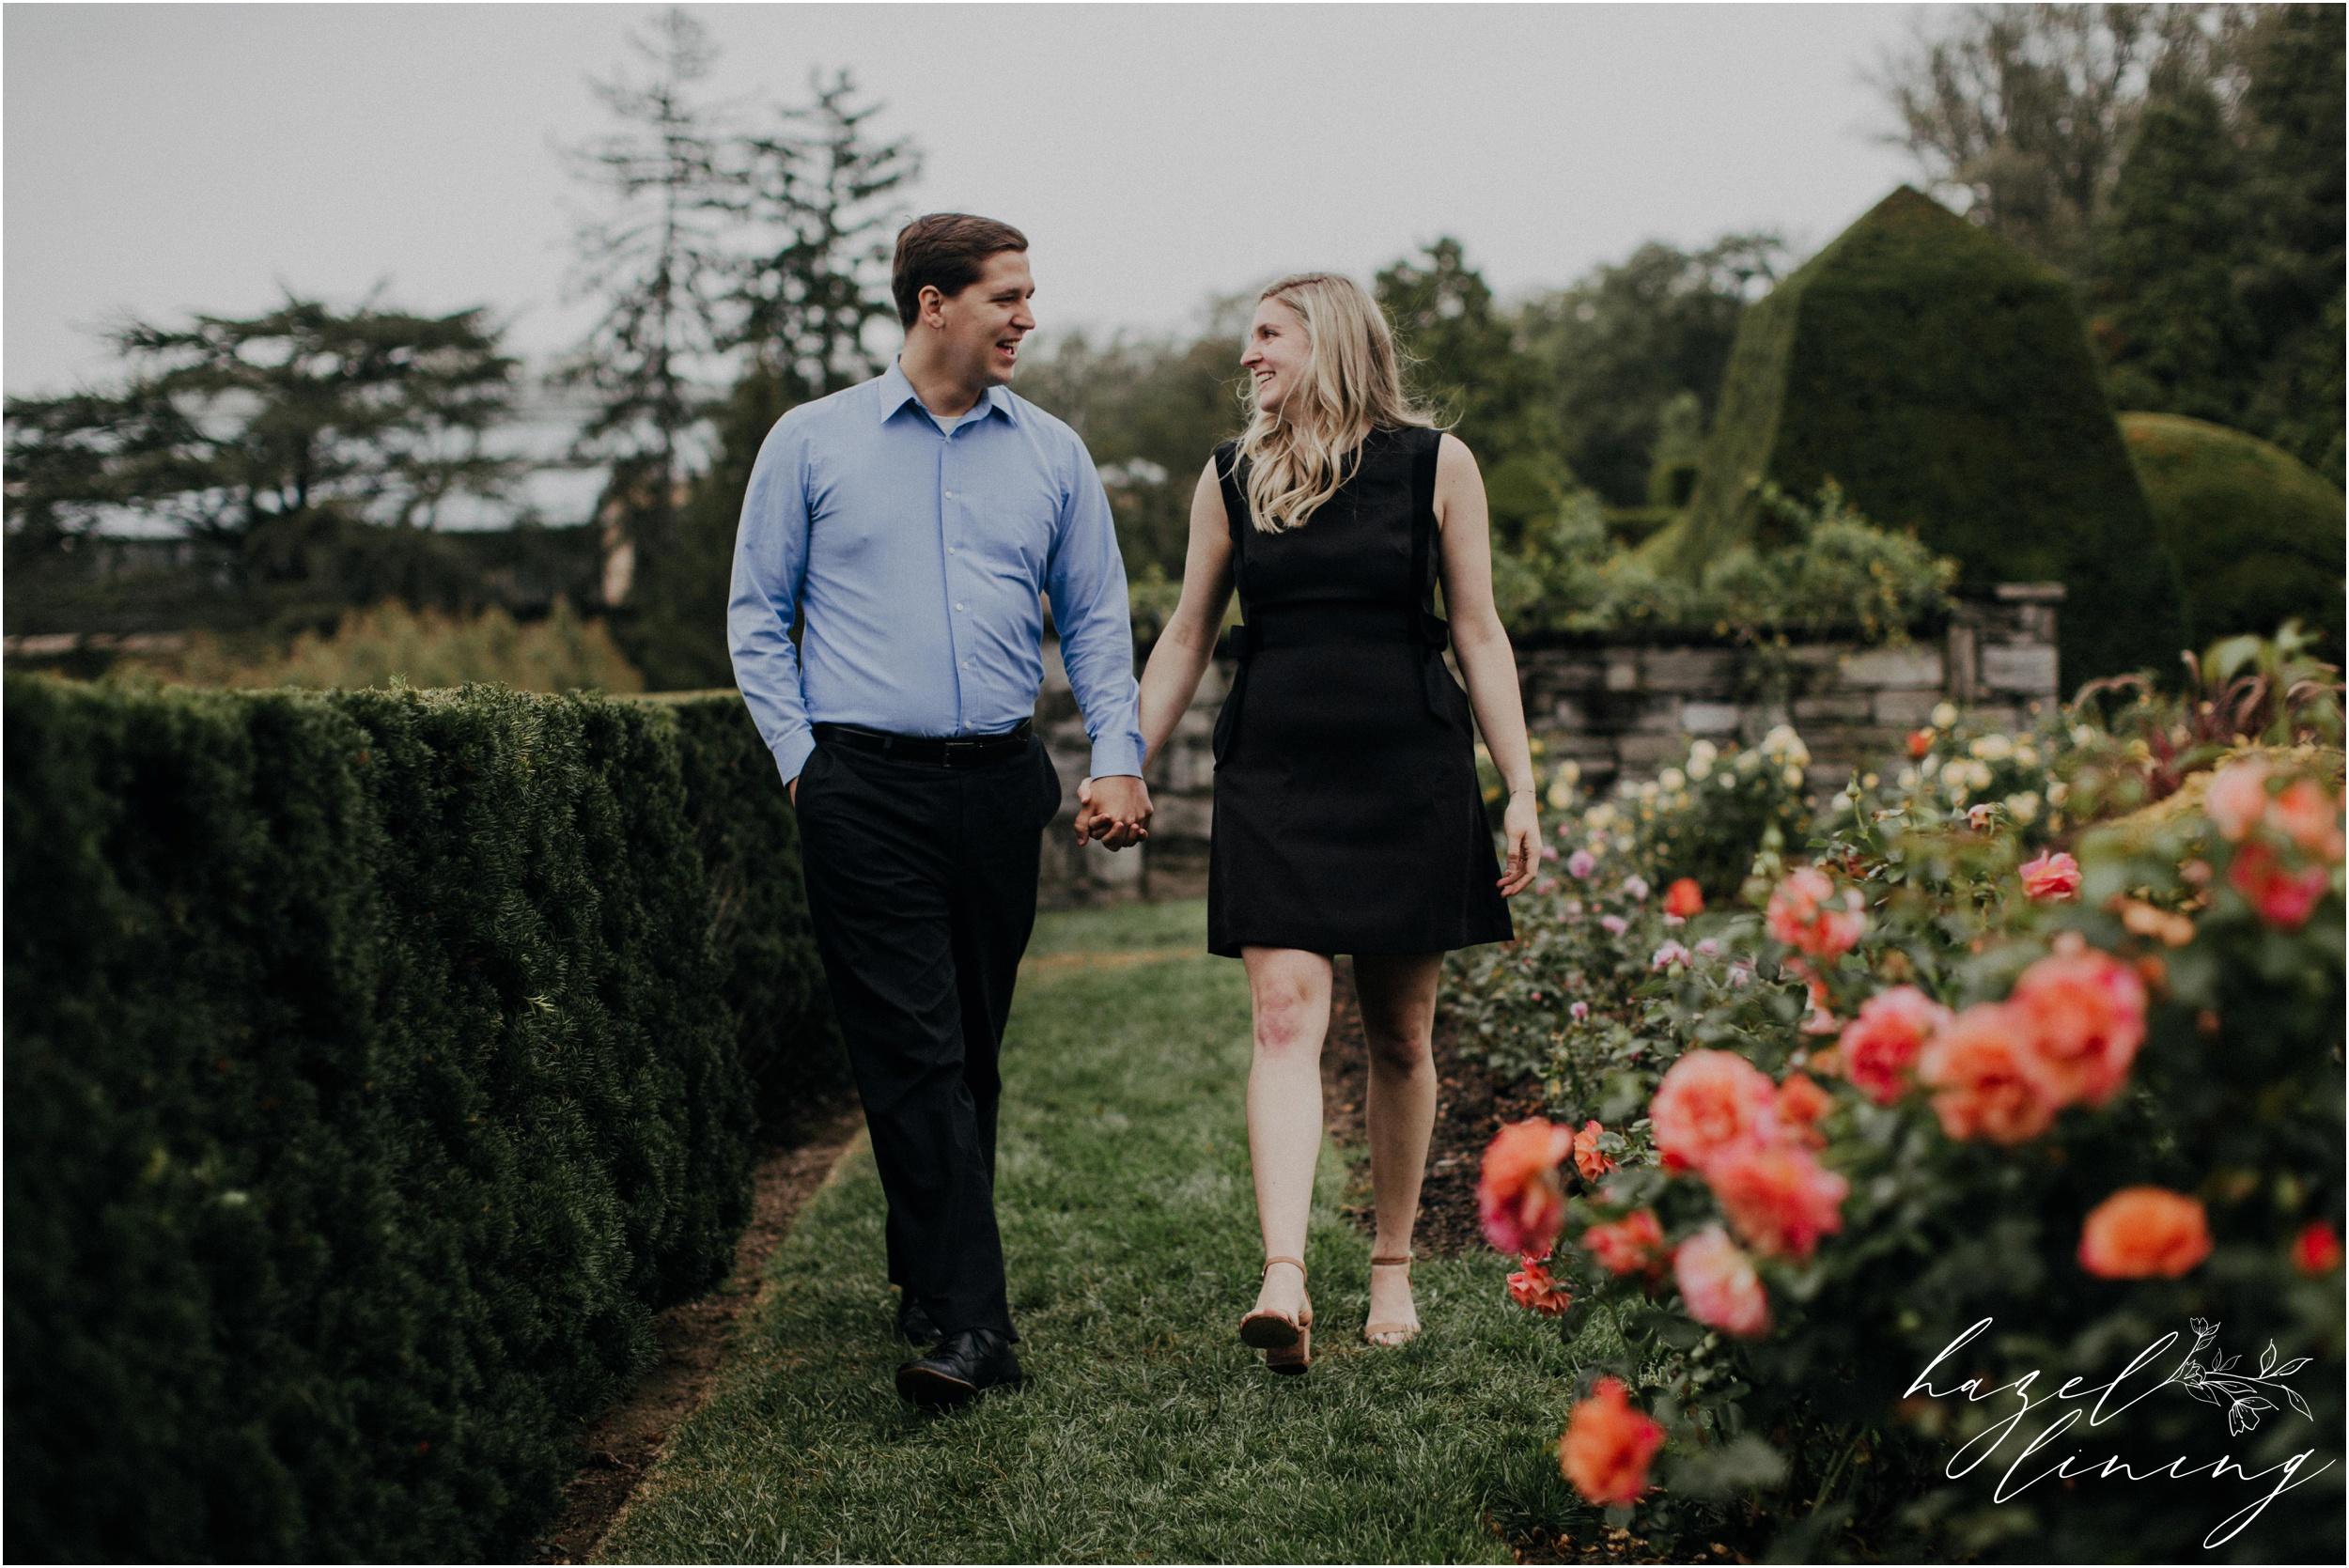 victoria-travis-logan-mayes-longwood-gardens-kennett-square-philadelphia-engagement-session-hazel-lining-photography-destination-elopement-wedding-engagement-photography_0014.jpg